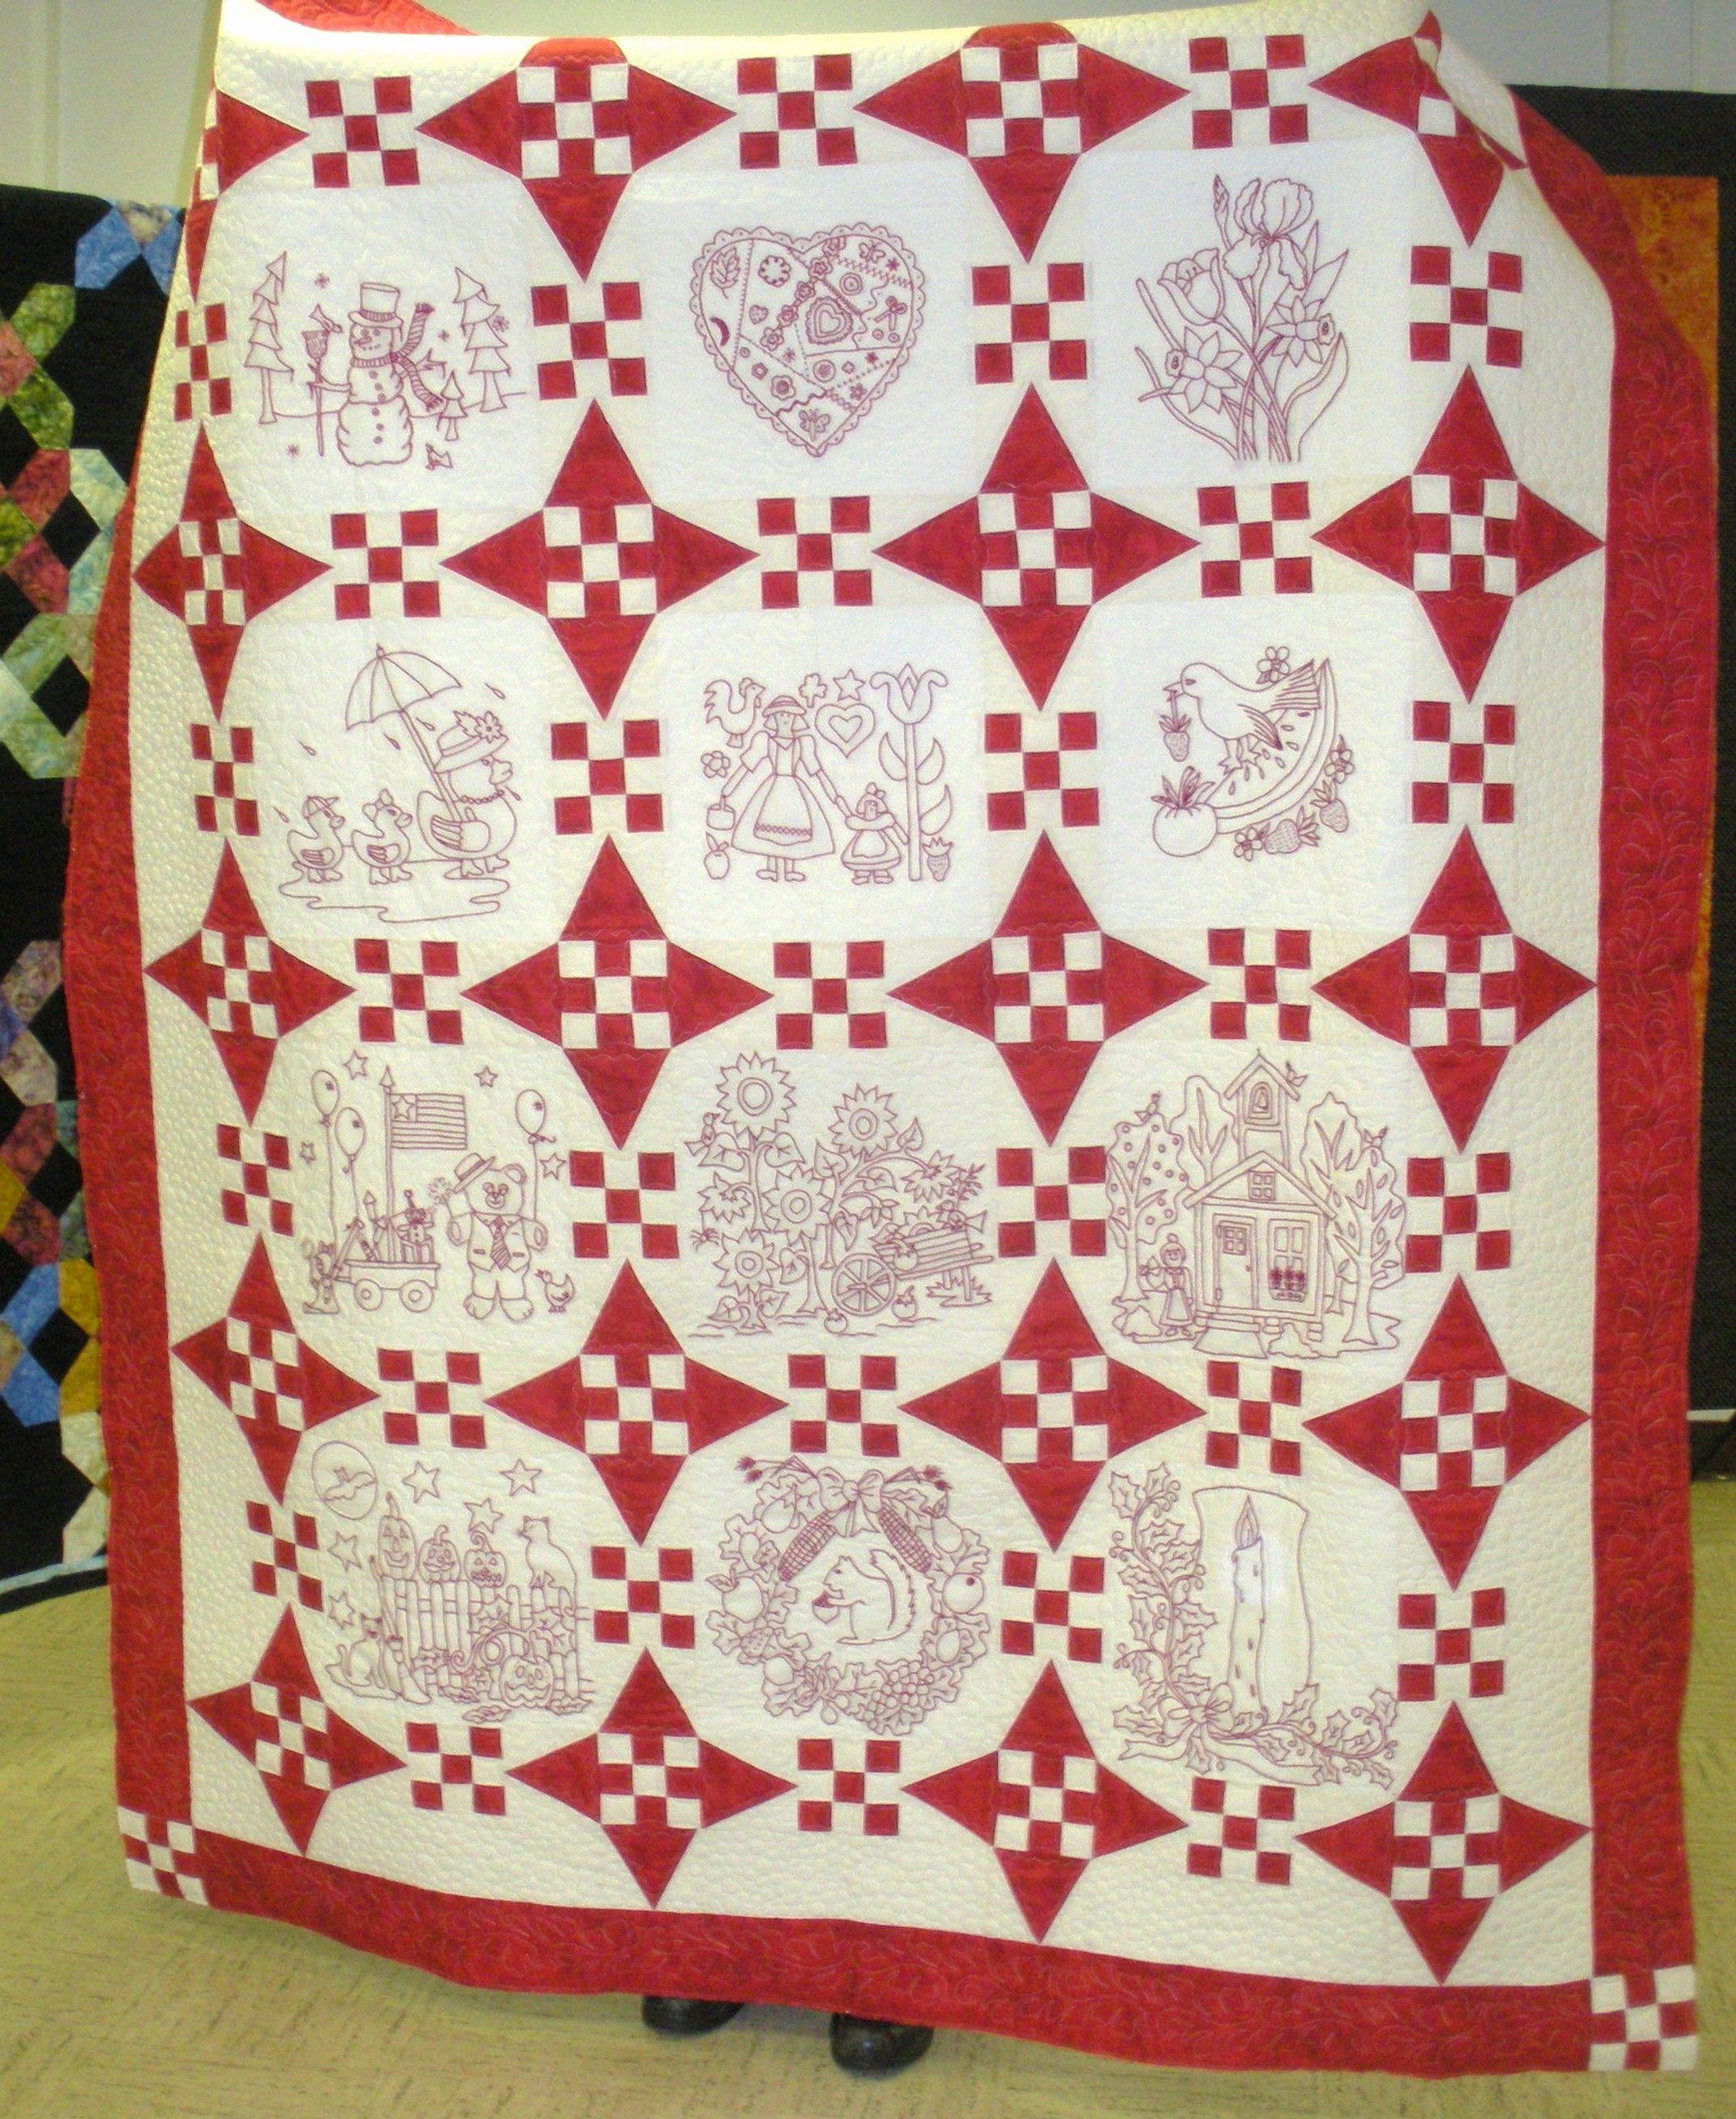 Joan S Redwork Calendar Quilt Quilted